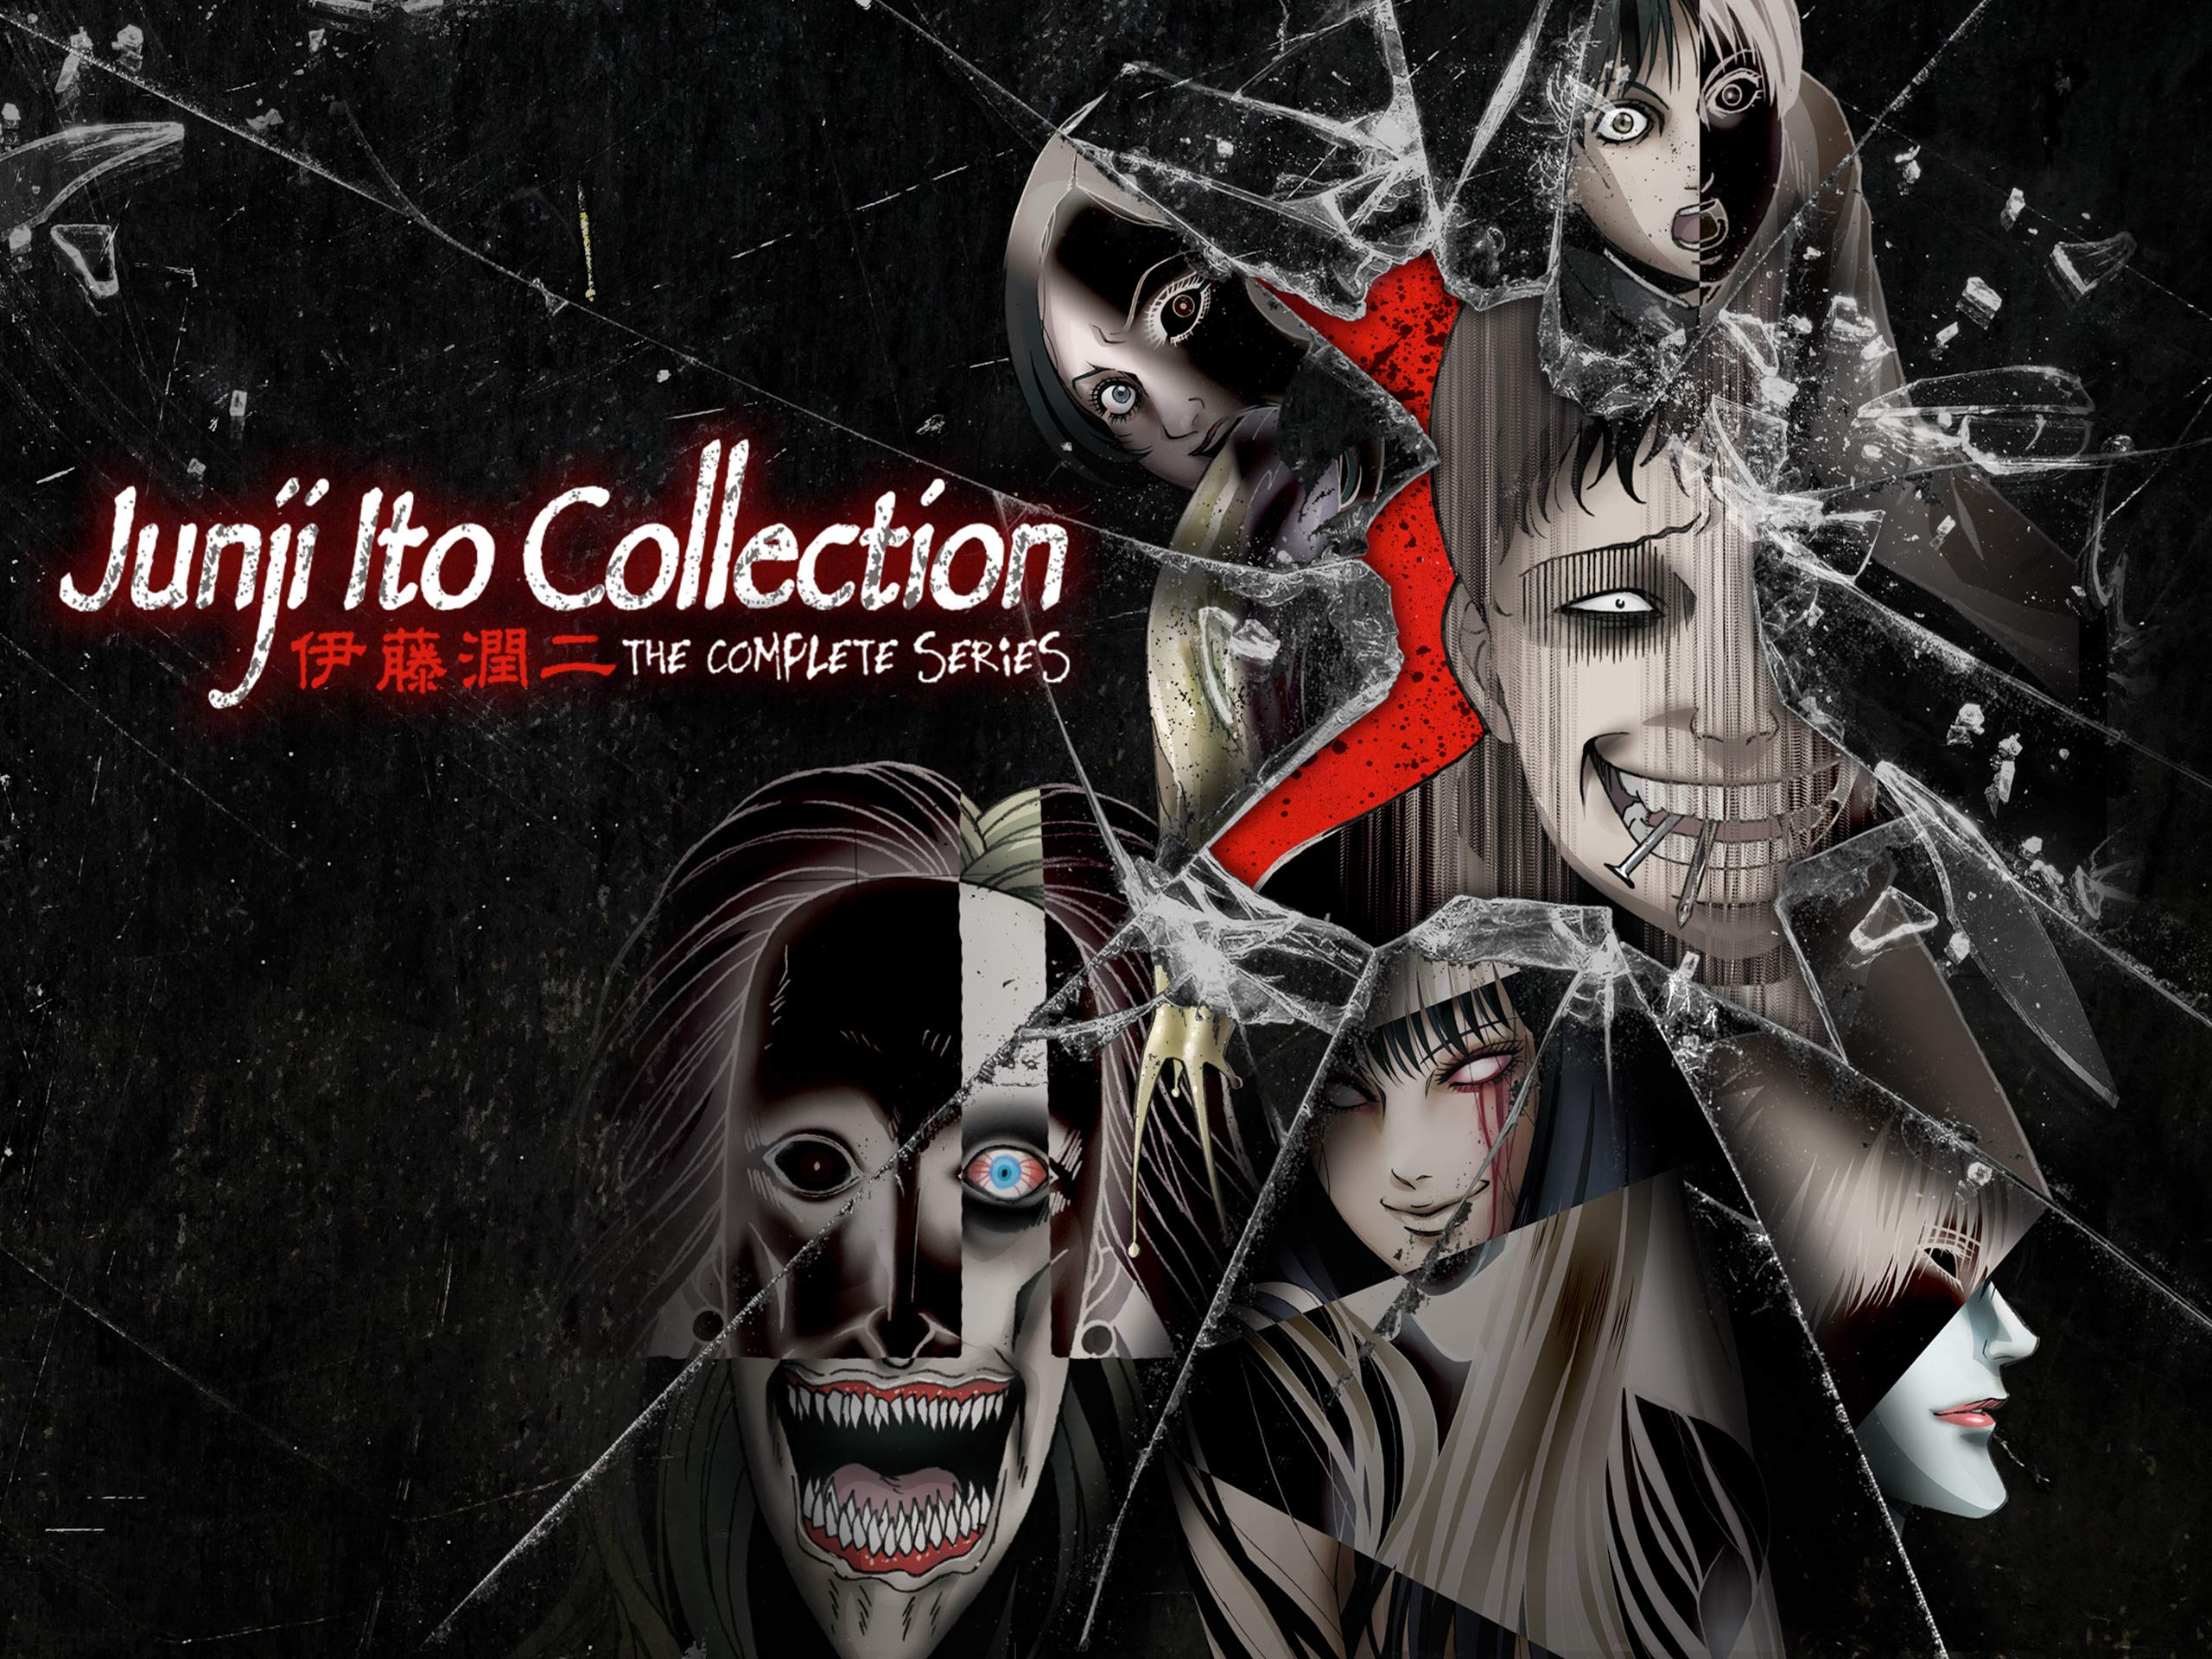 Amazon.com: Junji Ito Collection